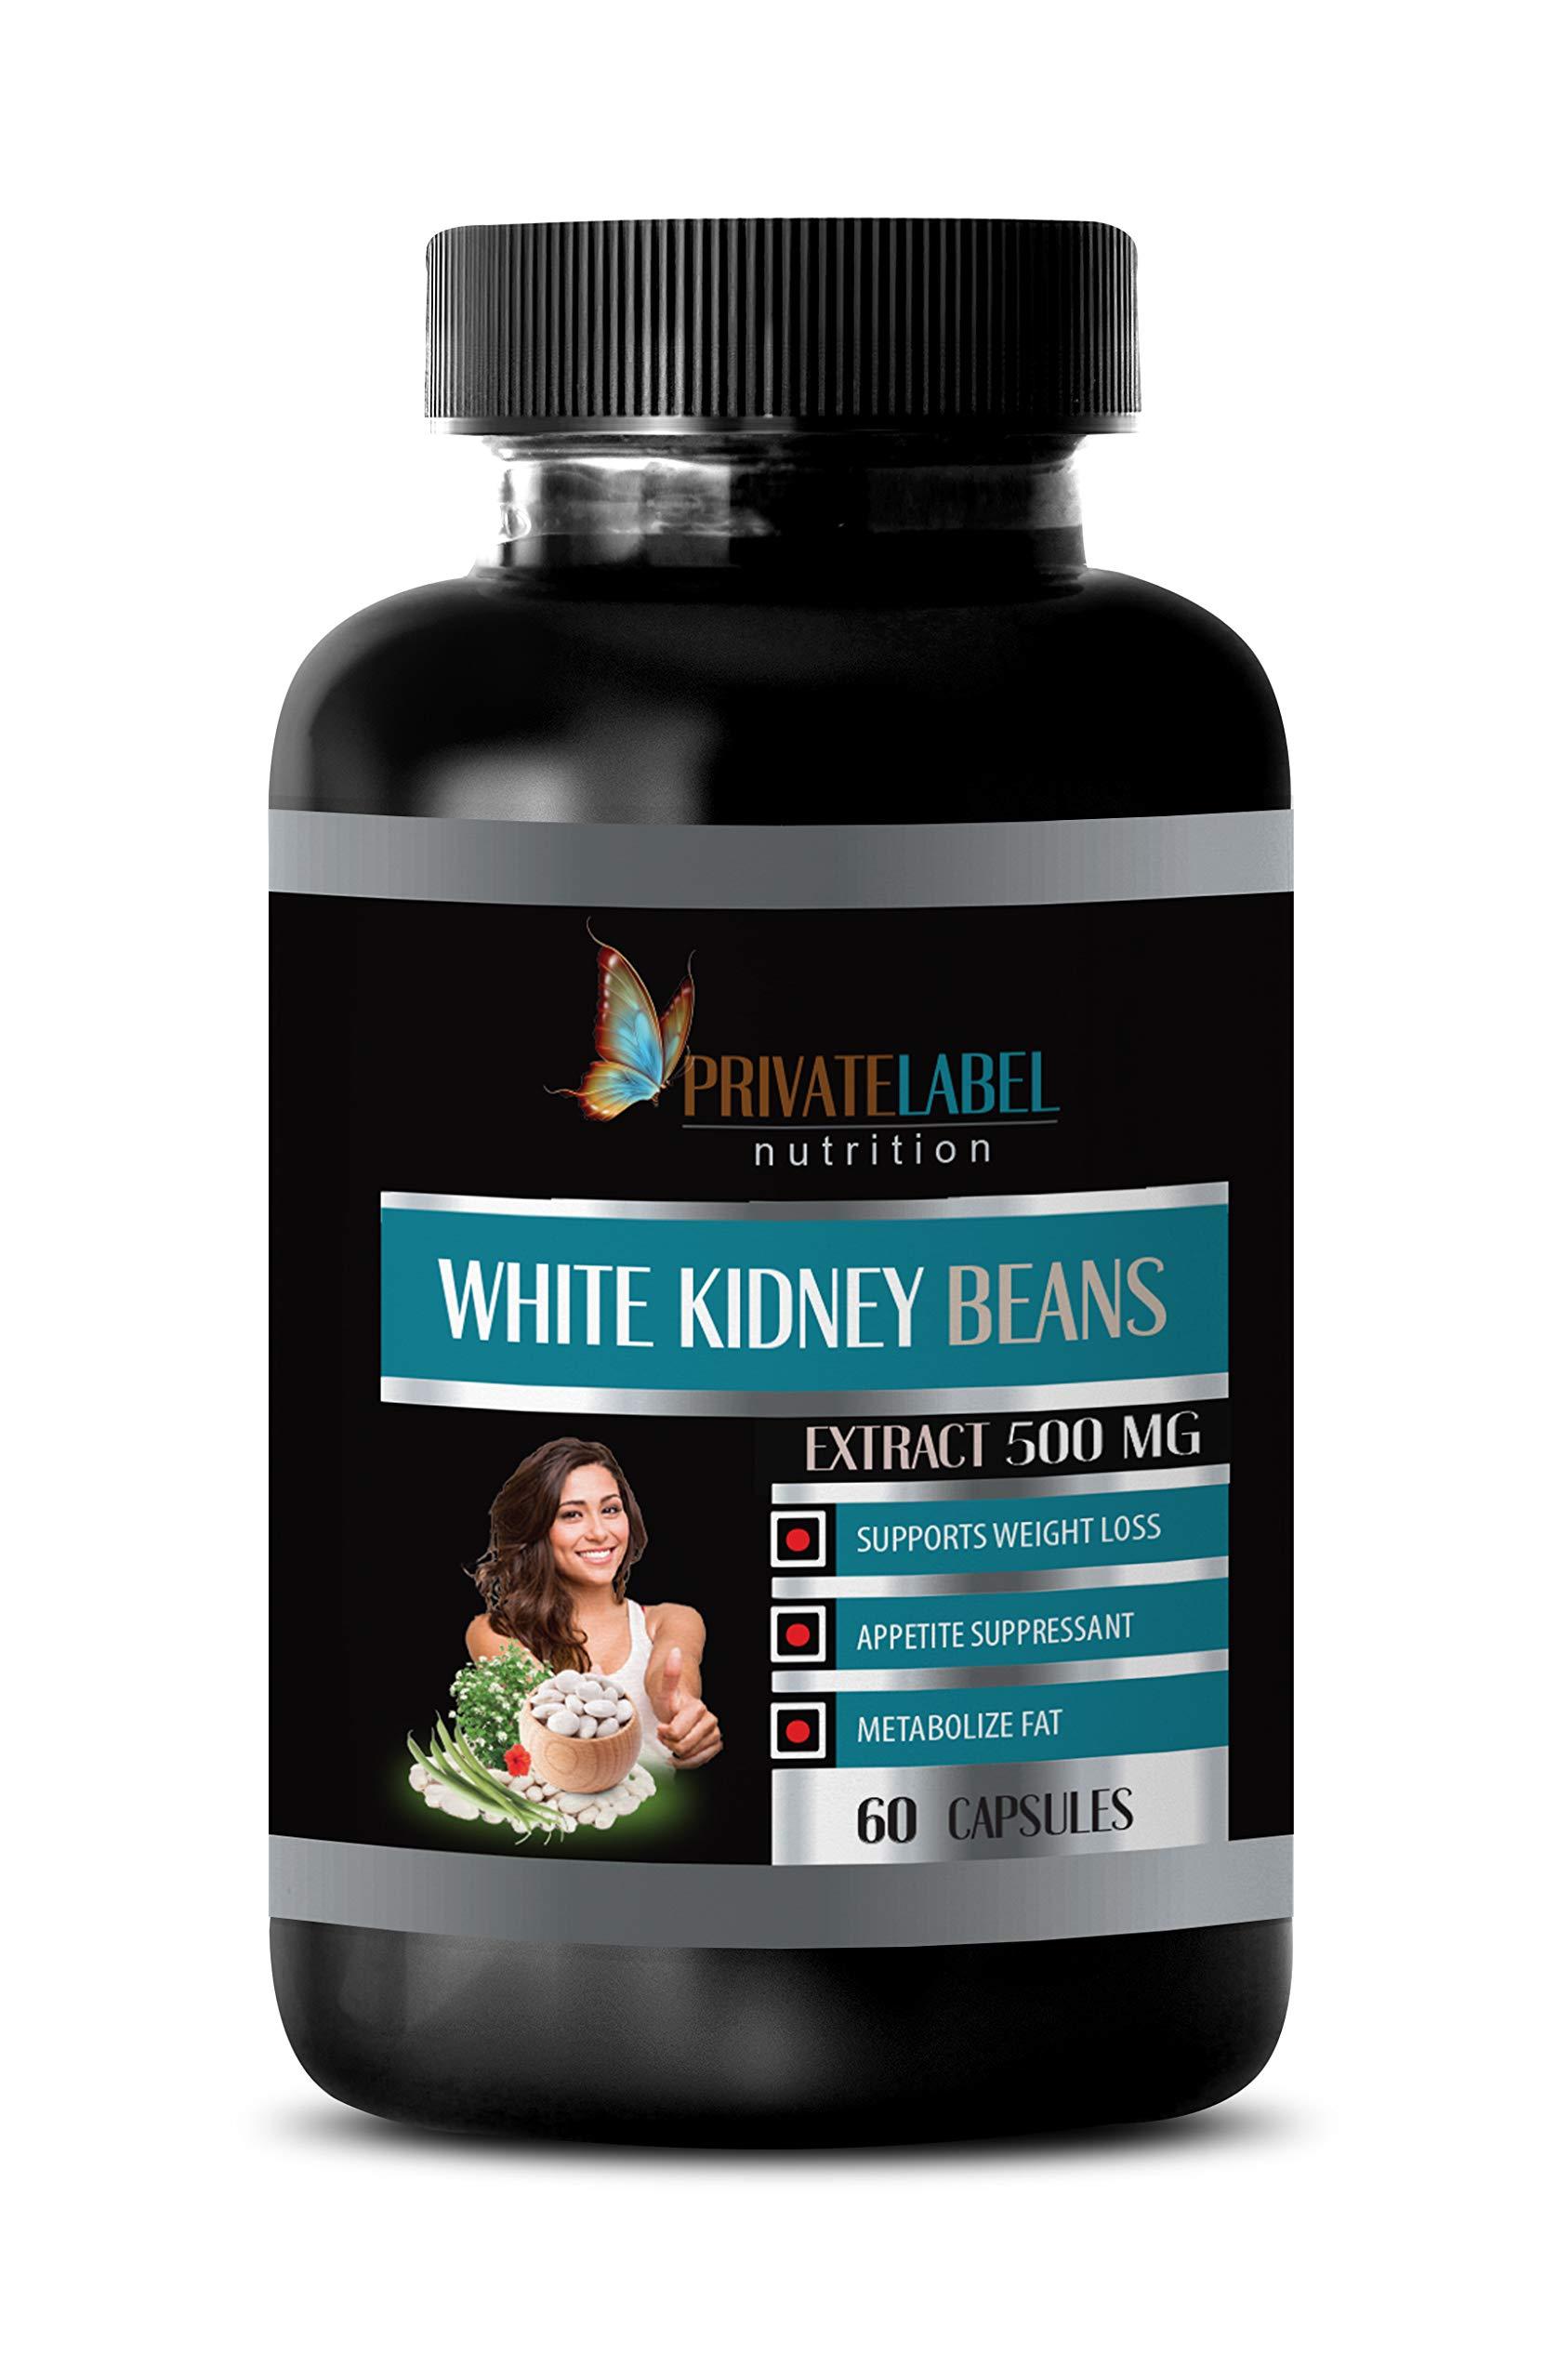 Appetite suppressant Fat Burning for Weight Loss - White Kidney Beans Extract 500 mg - White Kidney Bean Extract mega - 1 Bottle (60 Capsules)